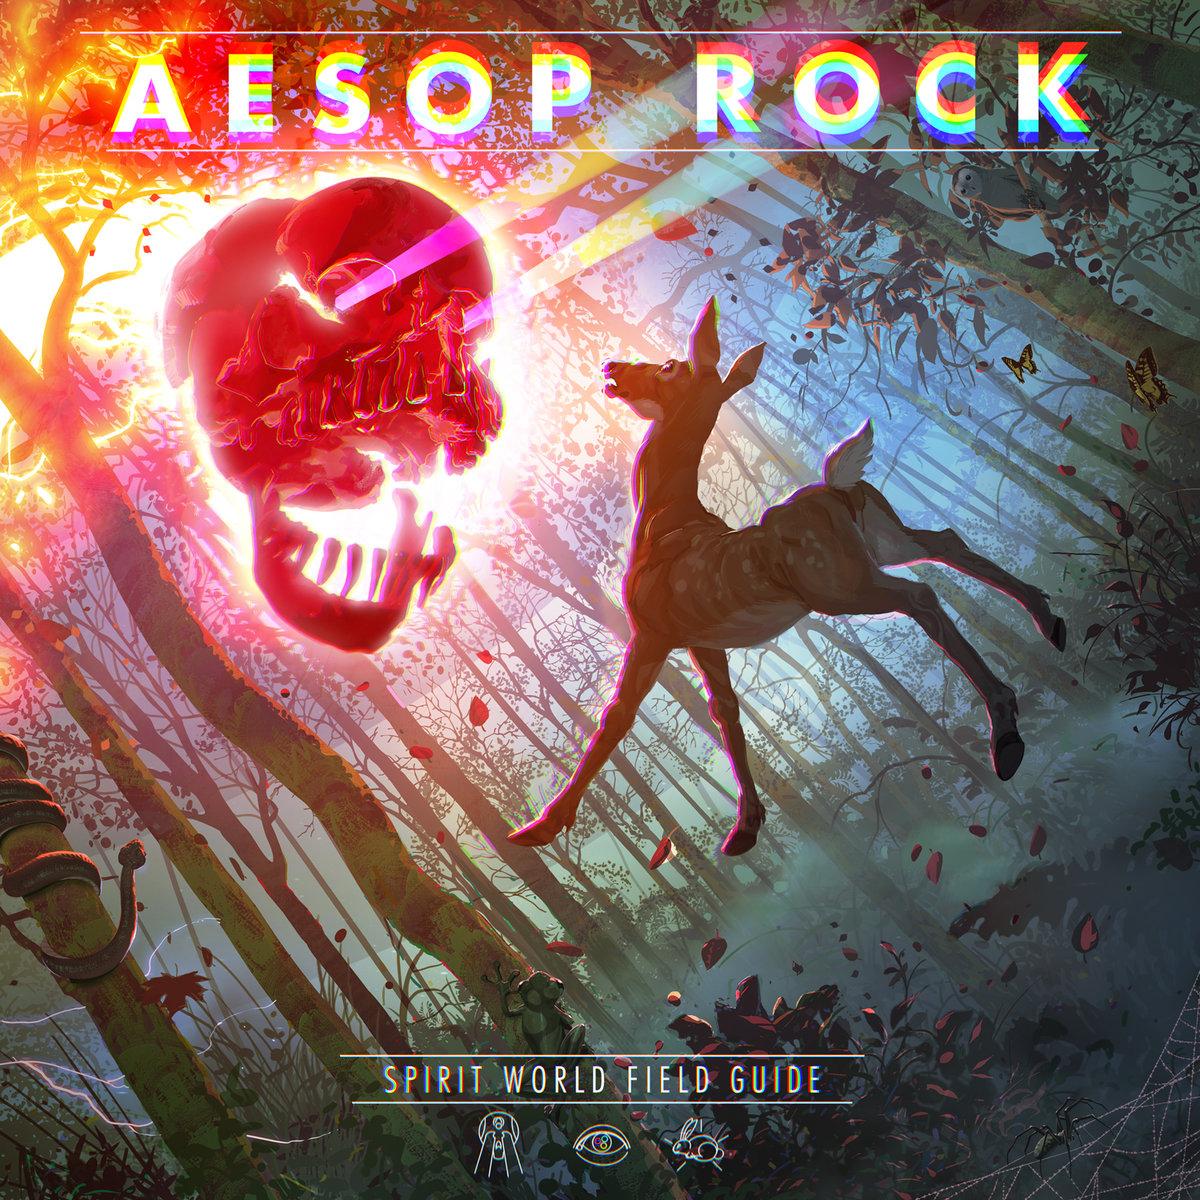 Spirit World Field Guide | Aesop Rock